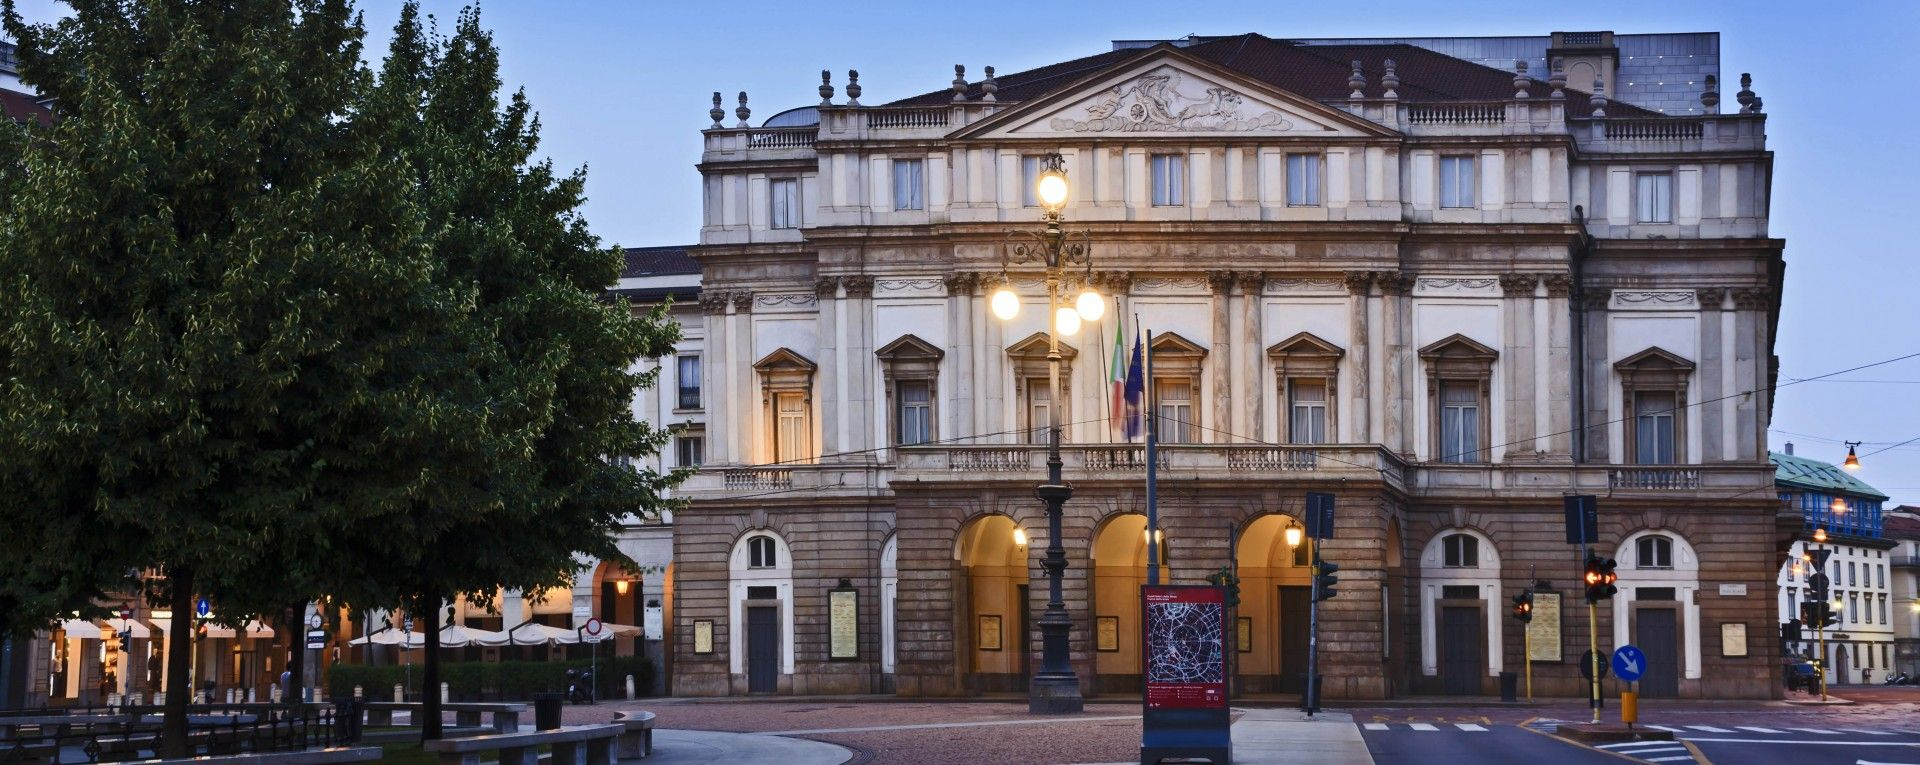 Hotels Near Opera House In Rome